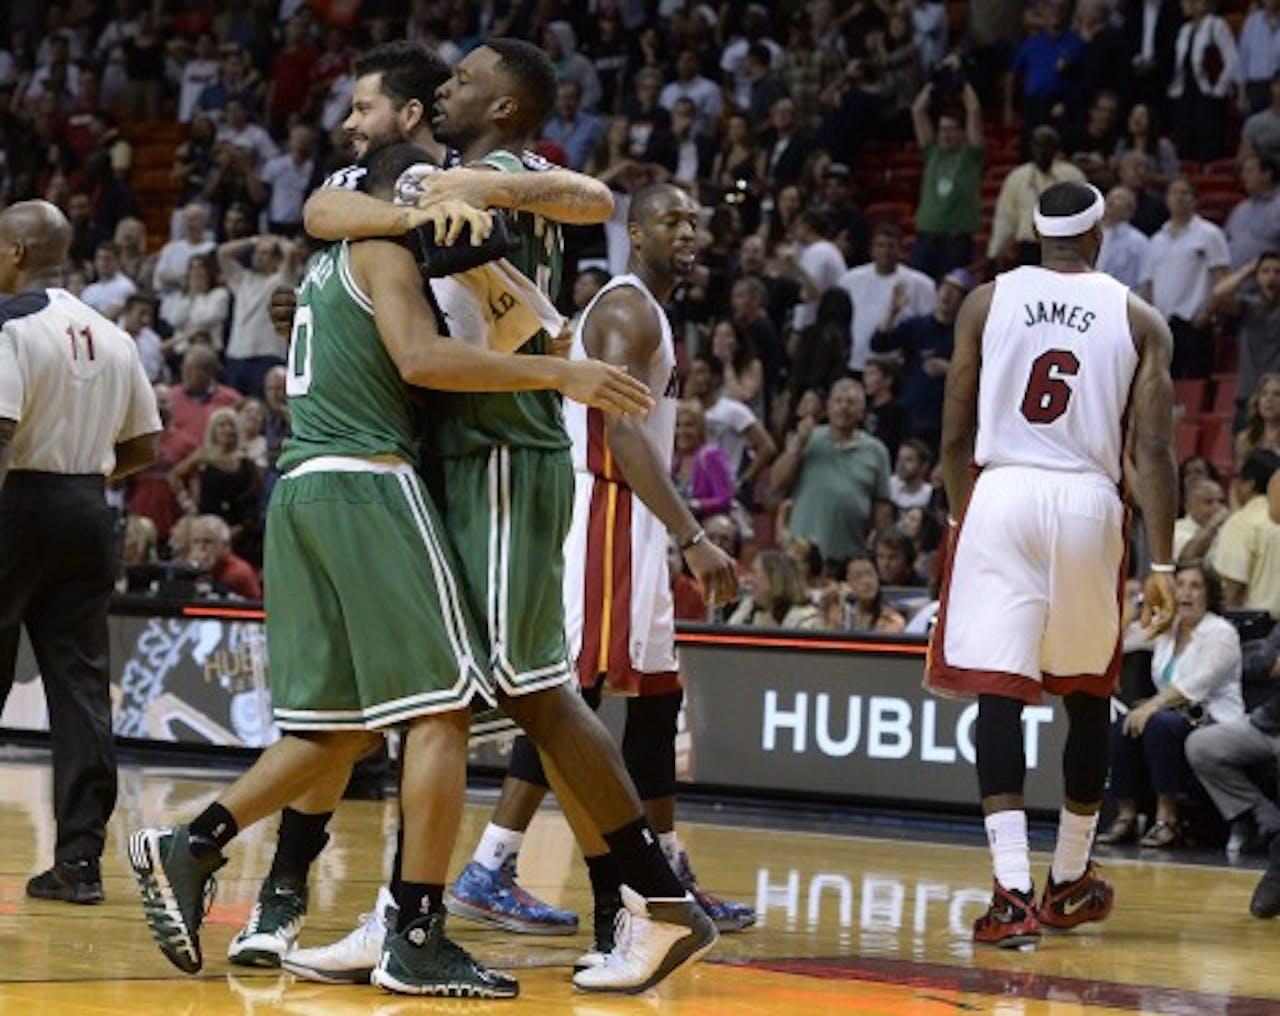 Miami Heat na de nederlaag tegen Boston Celtics. EPA